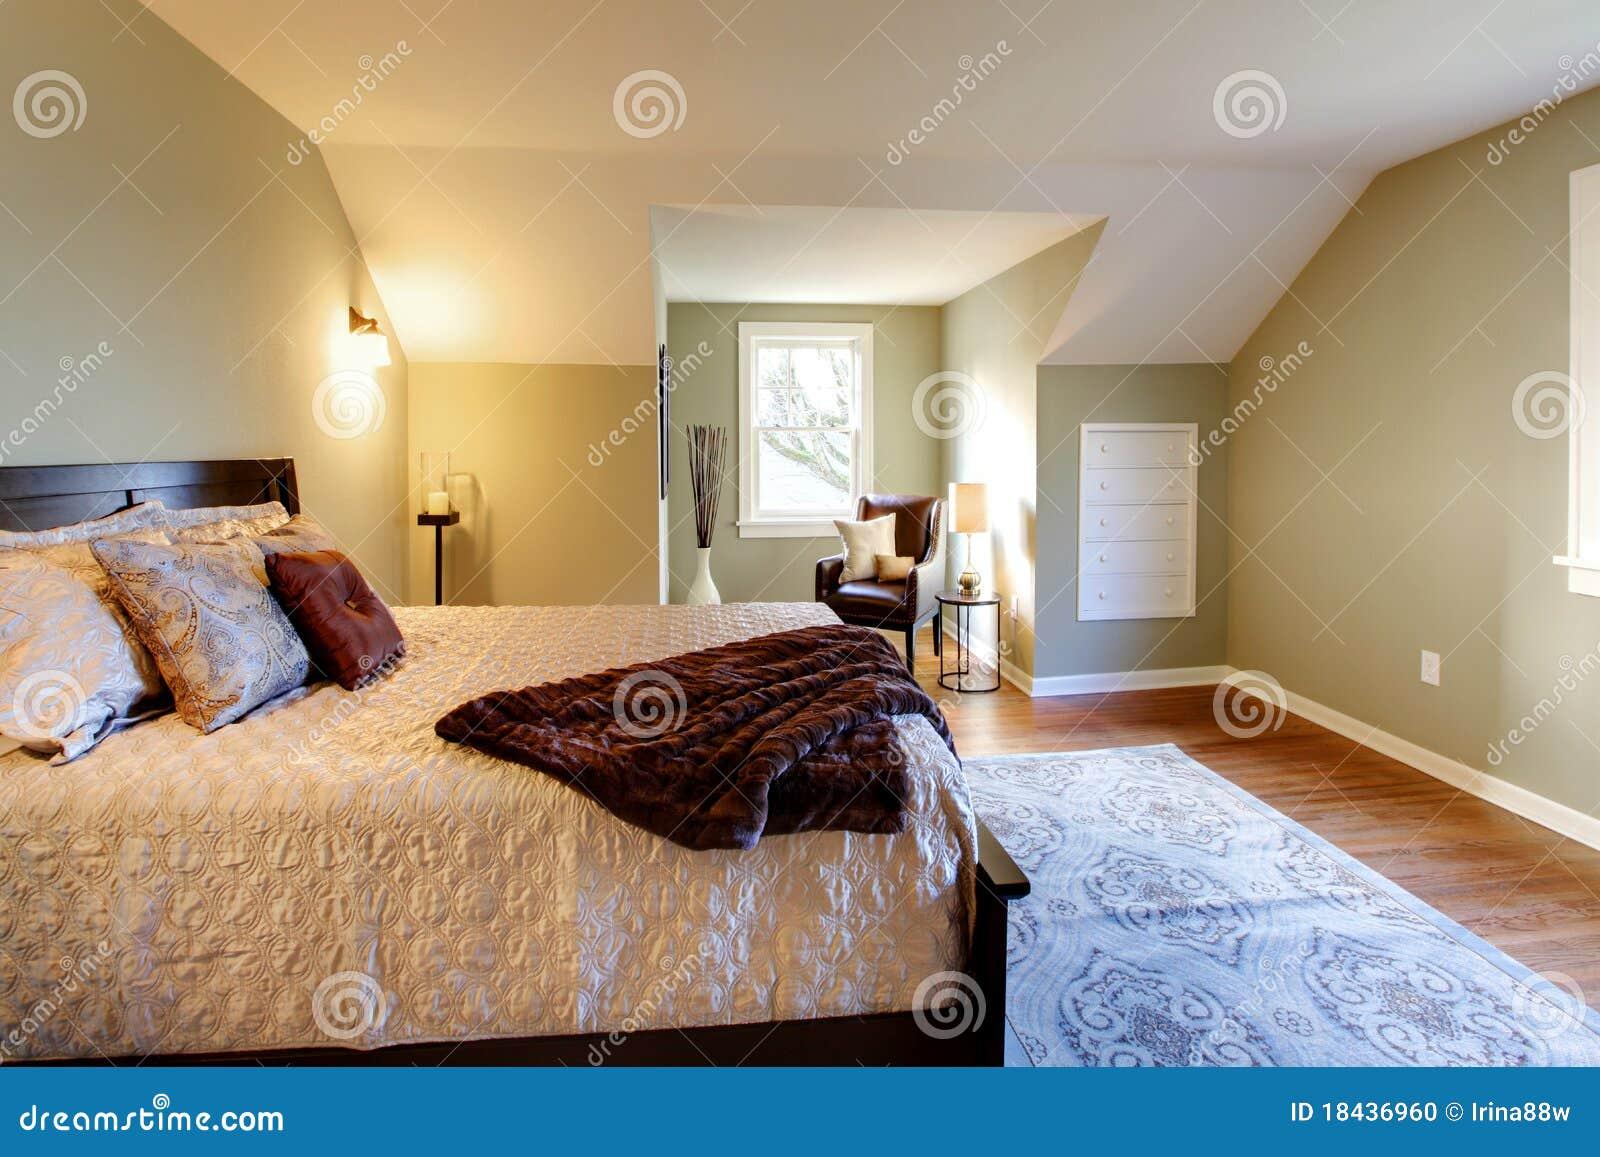 Slaapkamer Groen Wit : Verse groene slaapkamer met modern bruin bed stock foto